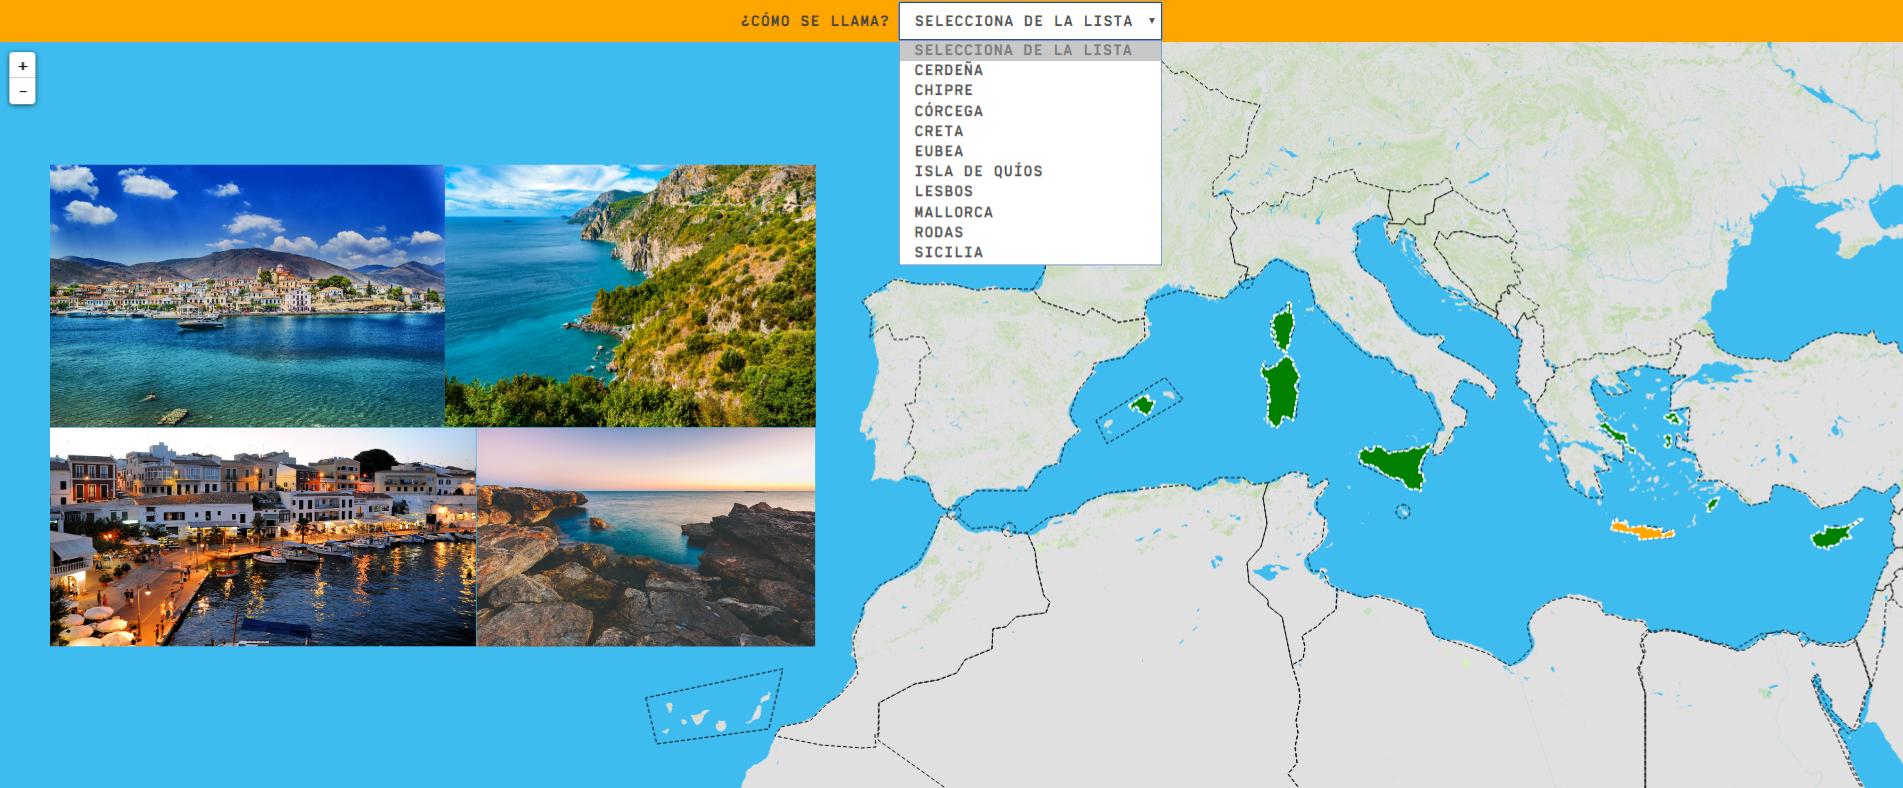 Mar Mediterrâneo: ilhas